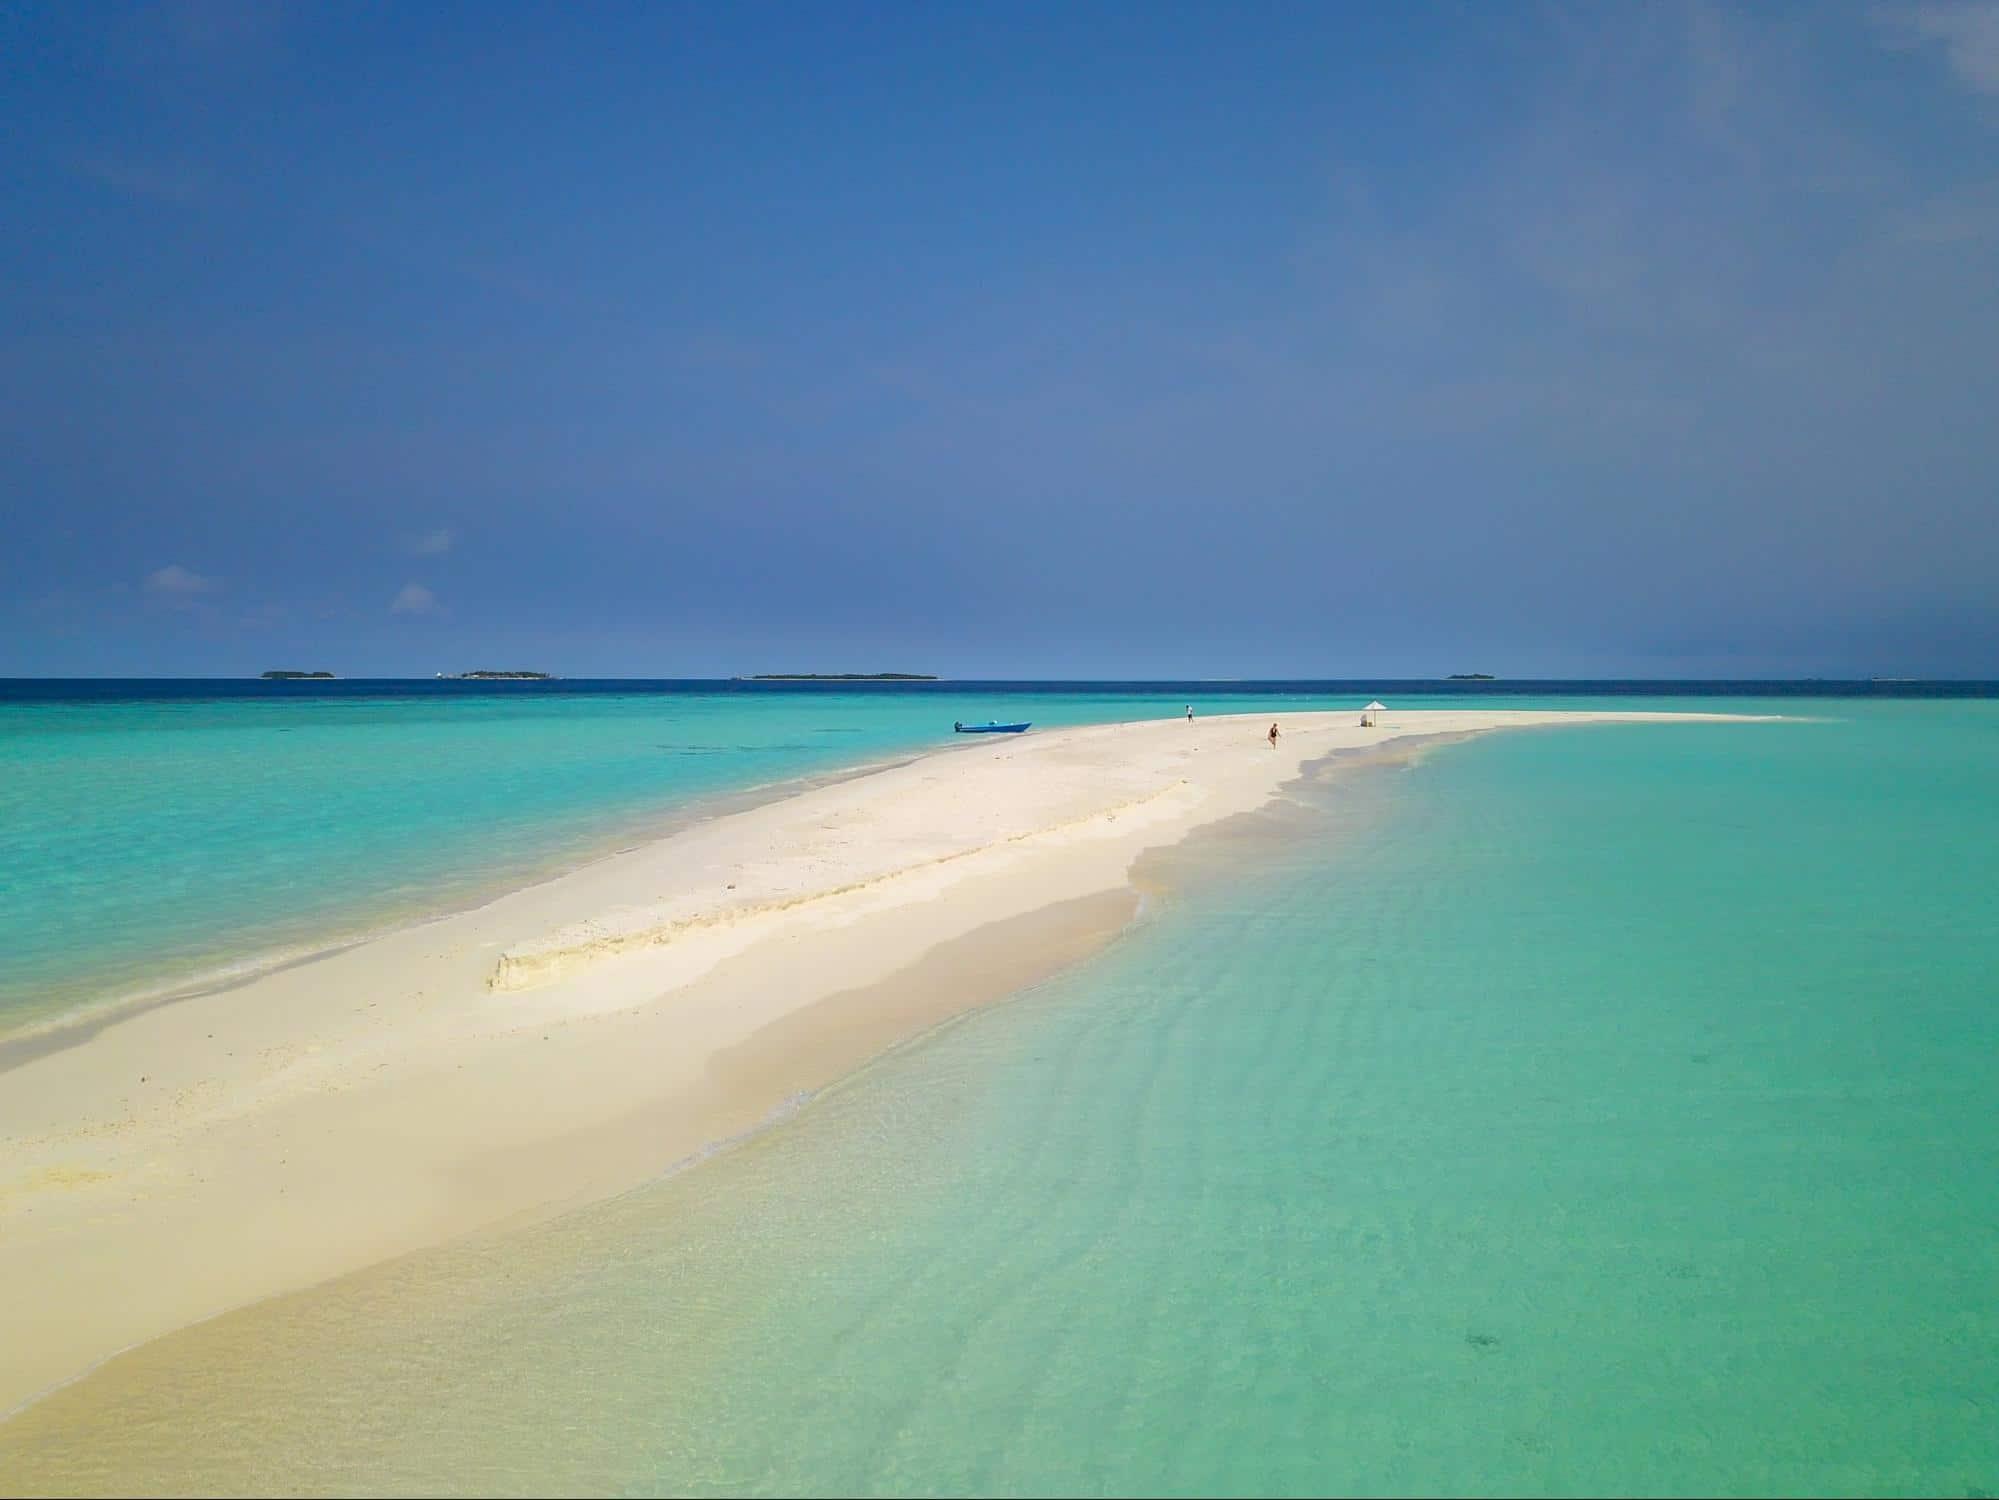 Milaidhoo sandbank stretch